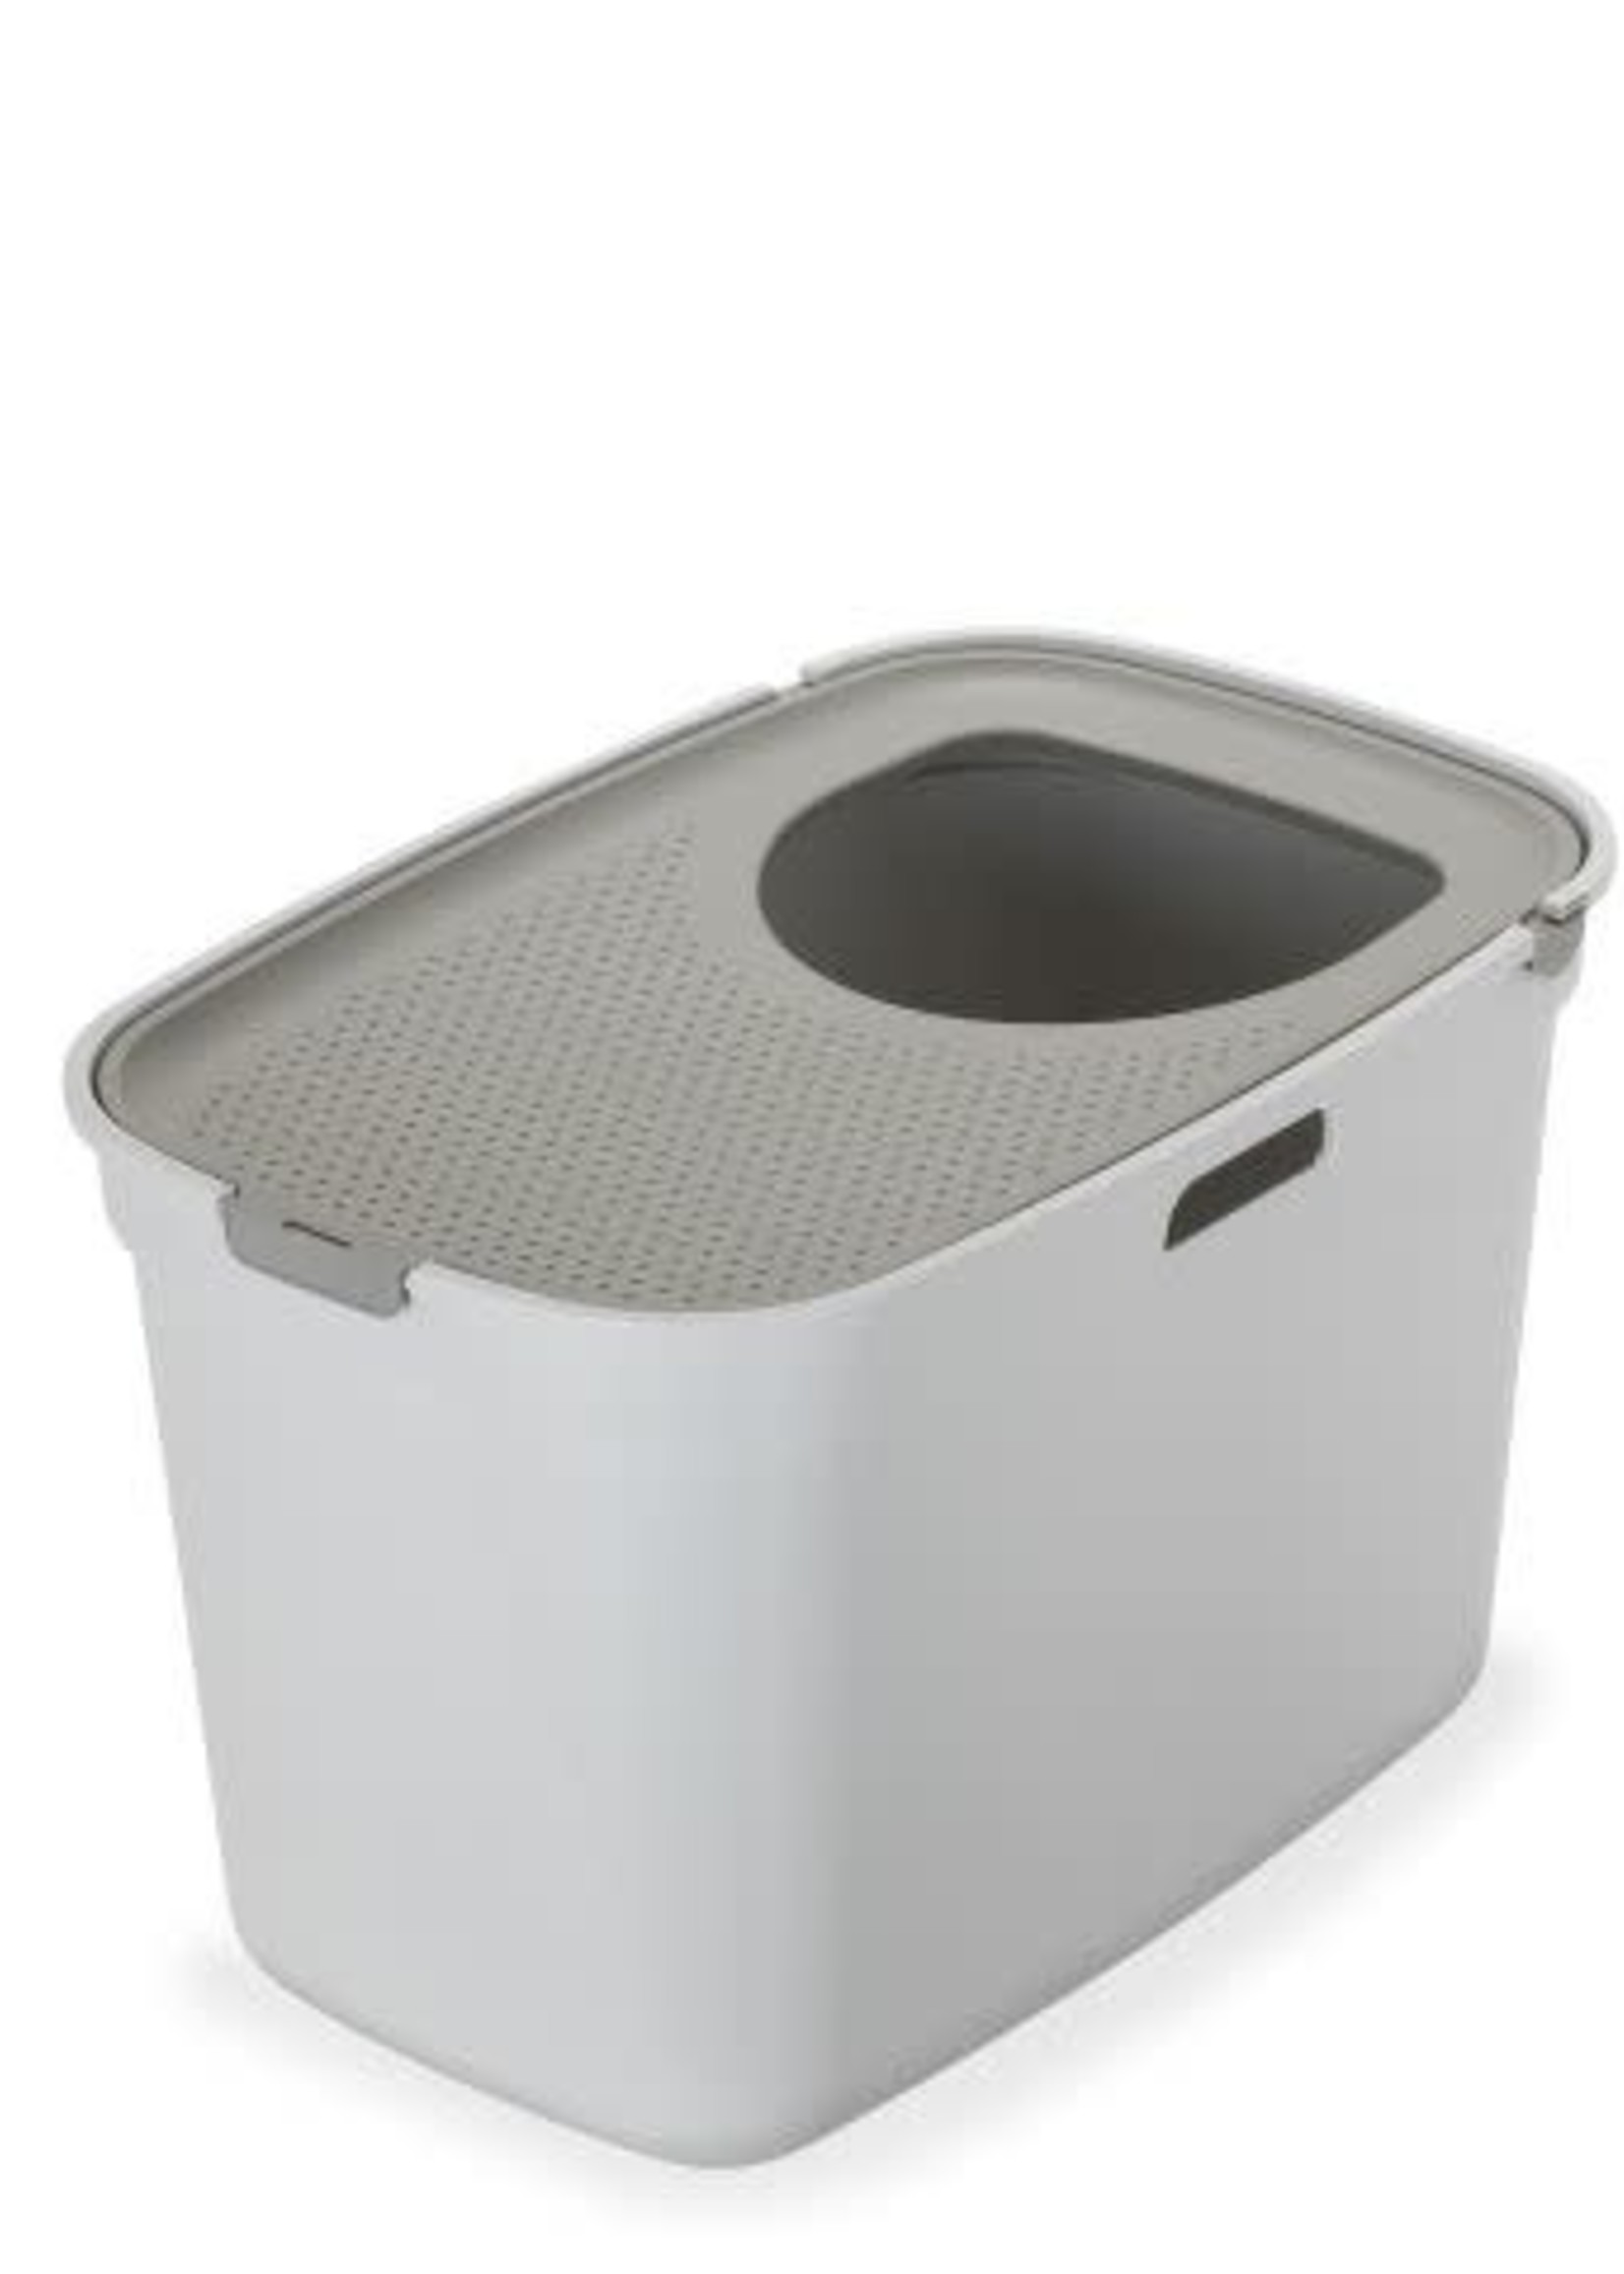 Moderna® Top Cat Closed Litter Box White & Warm Grey